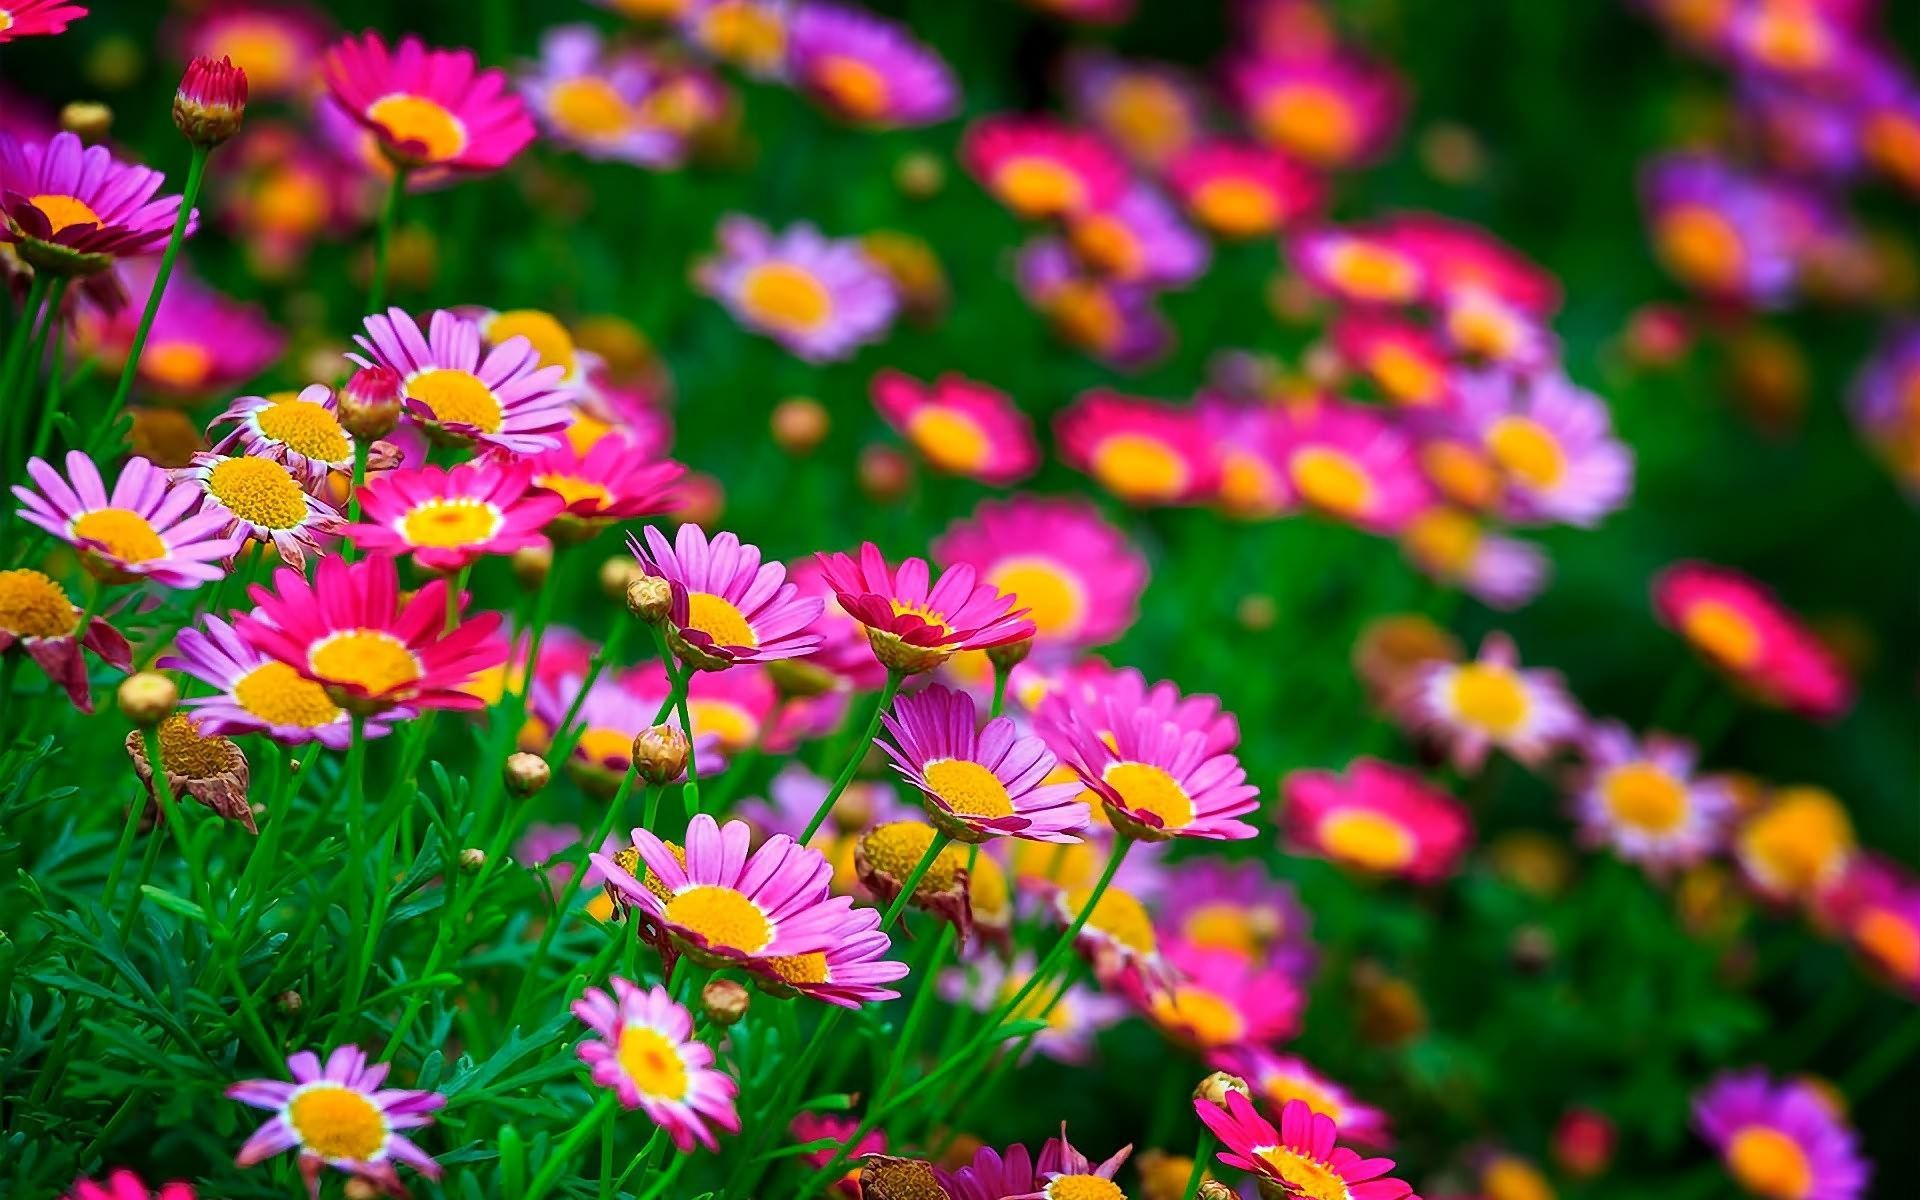 Most Beautiful Flowers Wallpaper Jpg 1920 1200 Flower Images Wallpapers Beautiful Flowers Images Beautiful Flowers Pictures